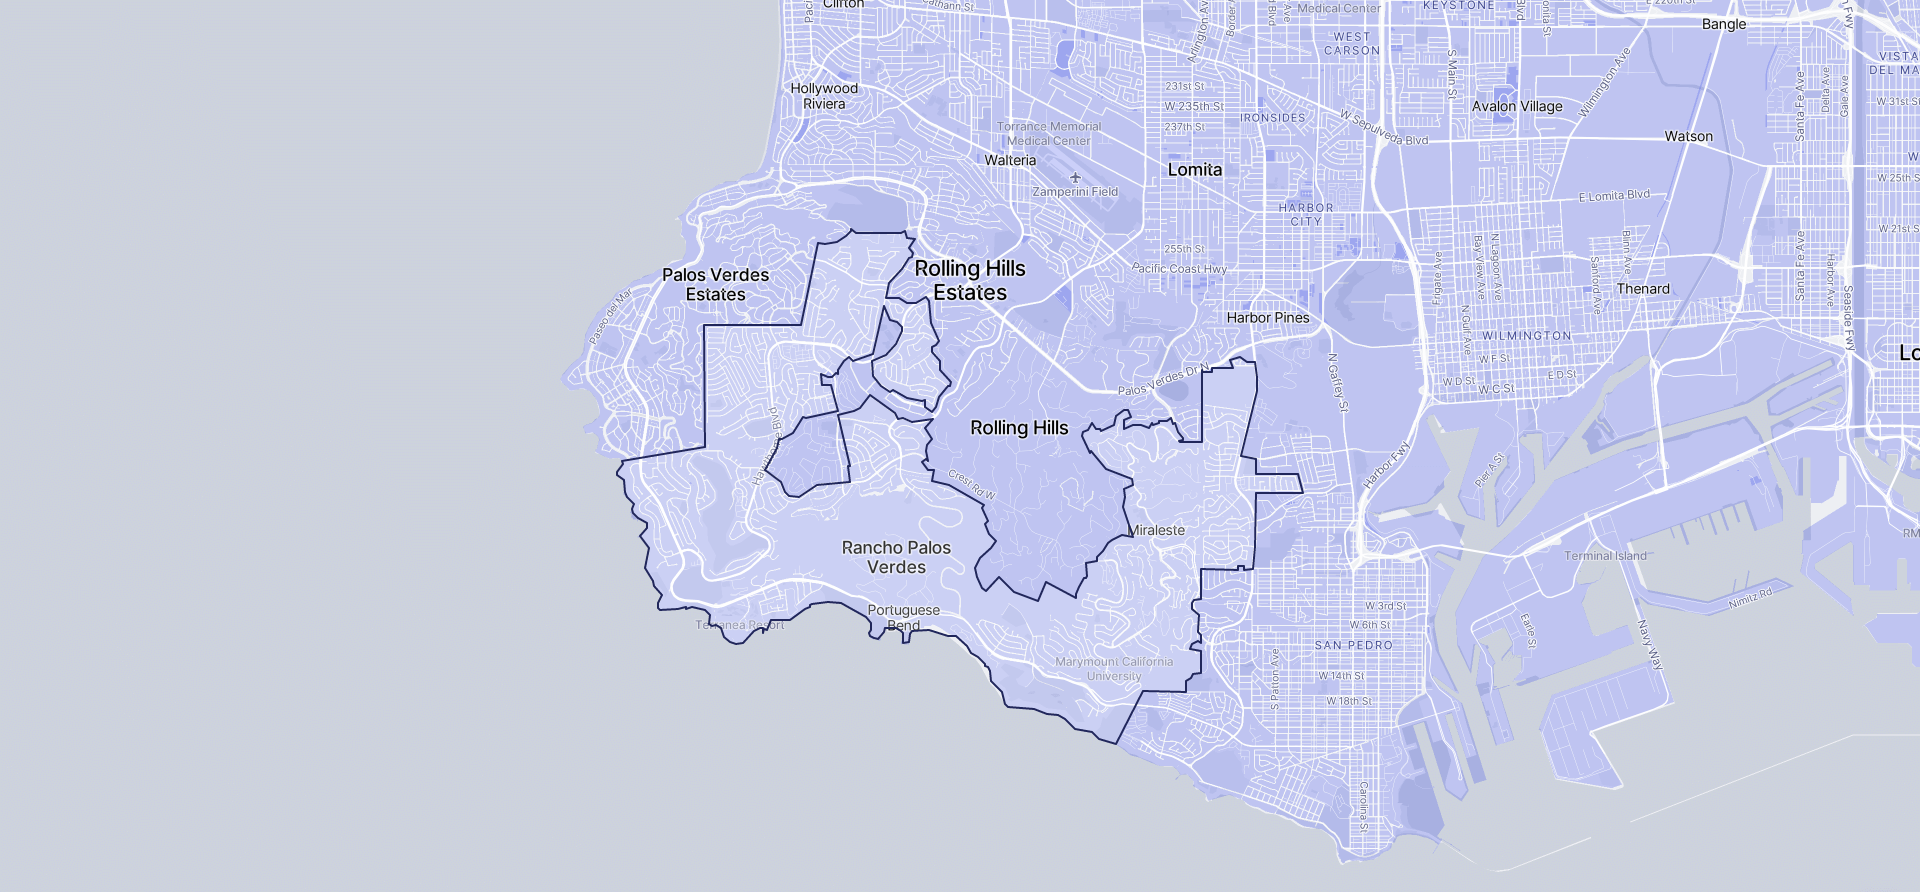 Image of Rancho Palos Verdes boundaries on a map.